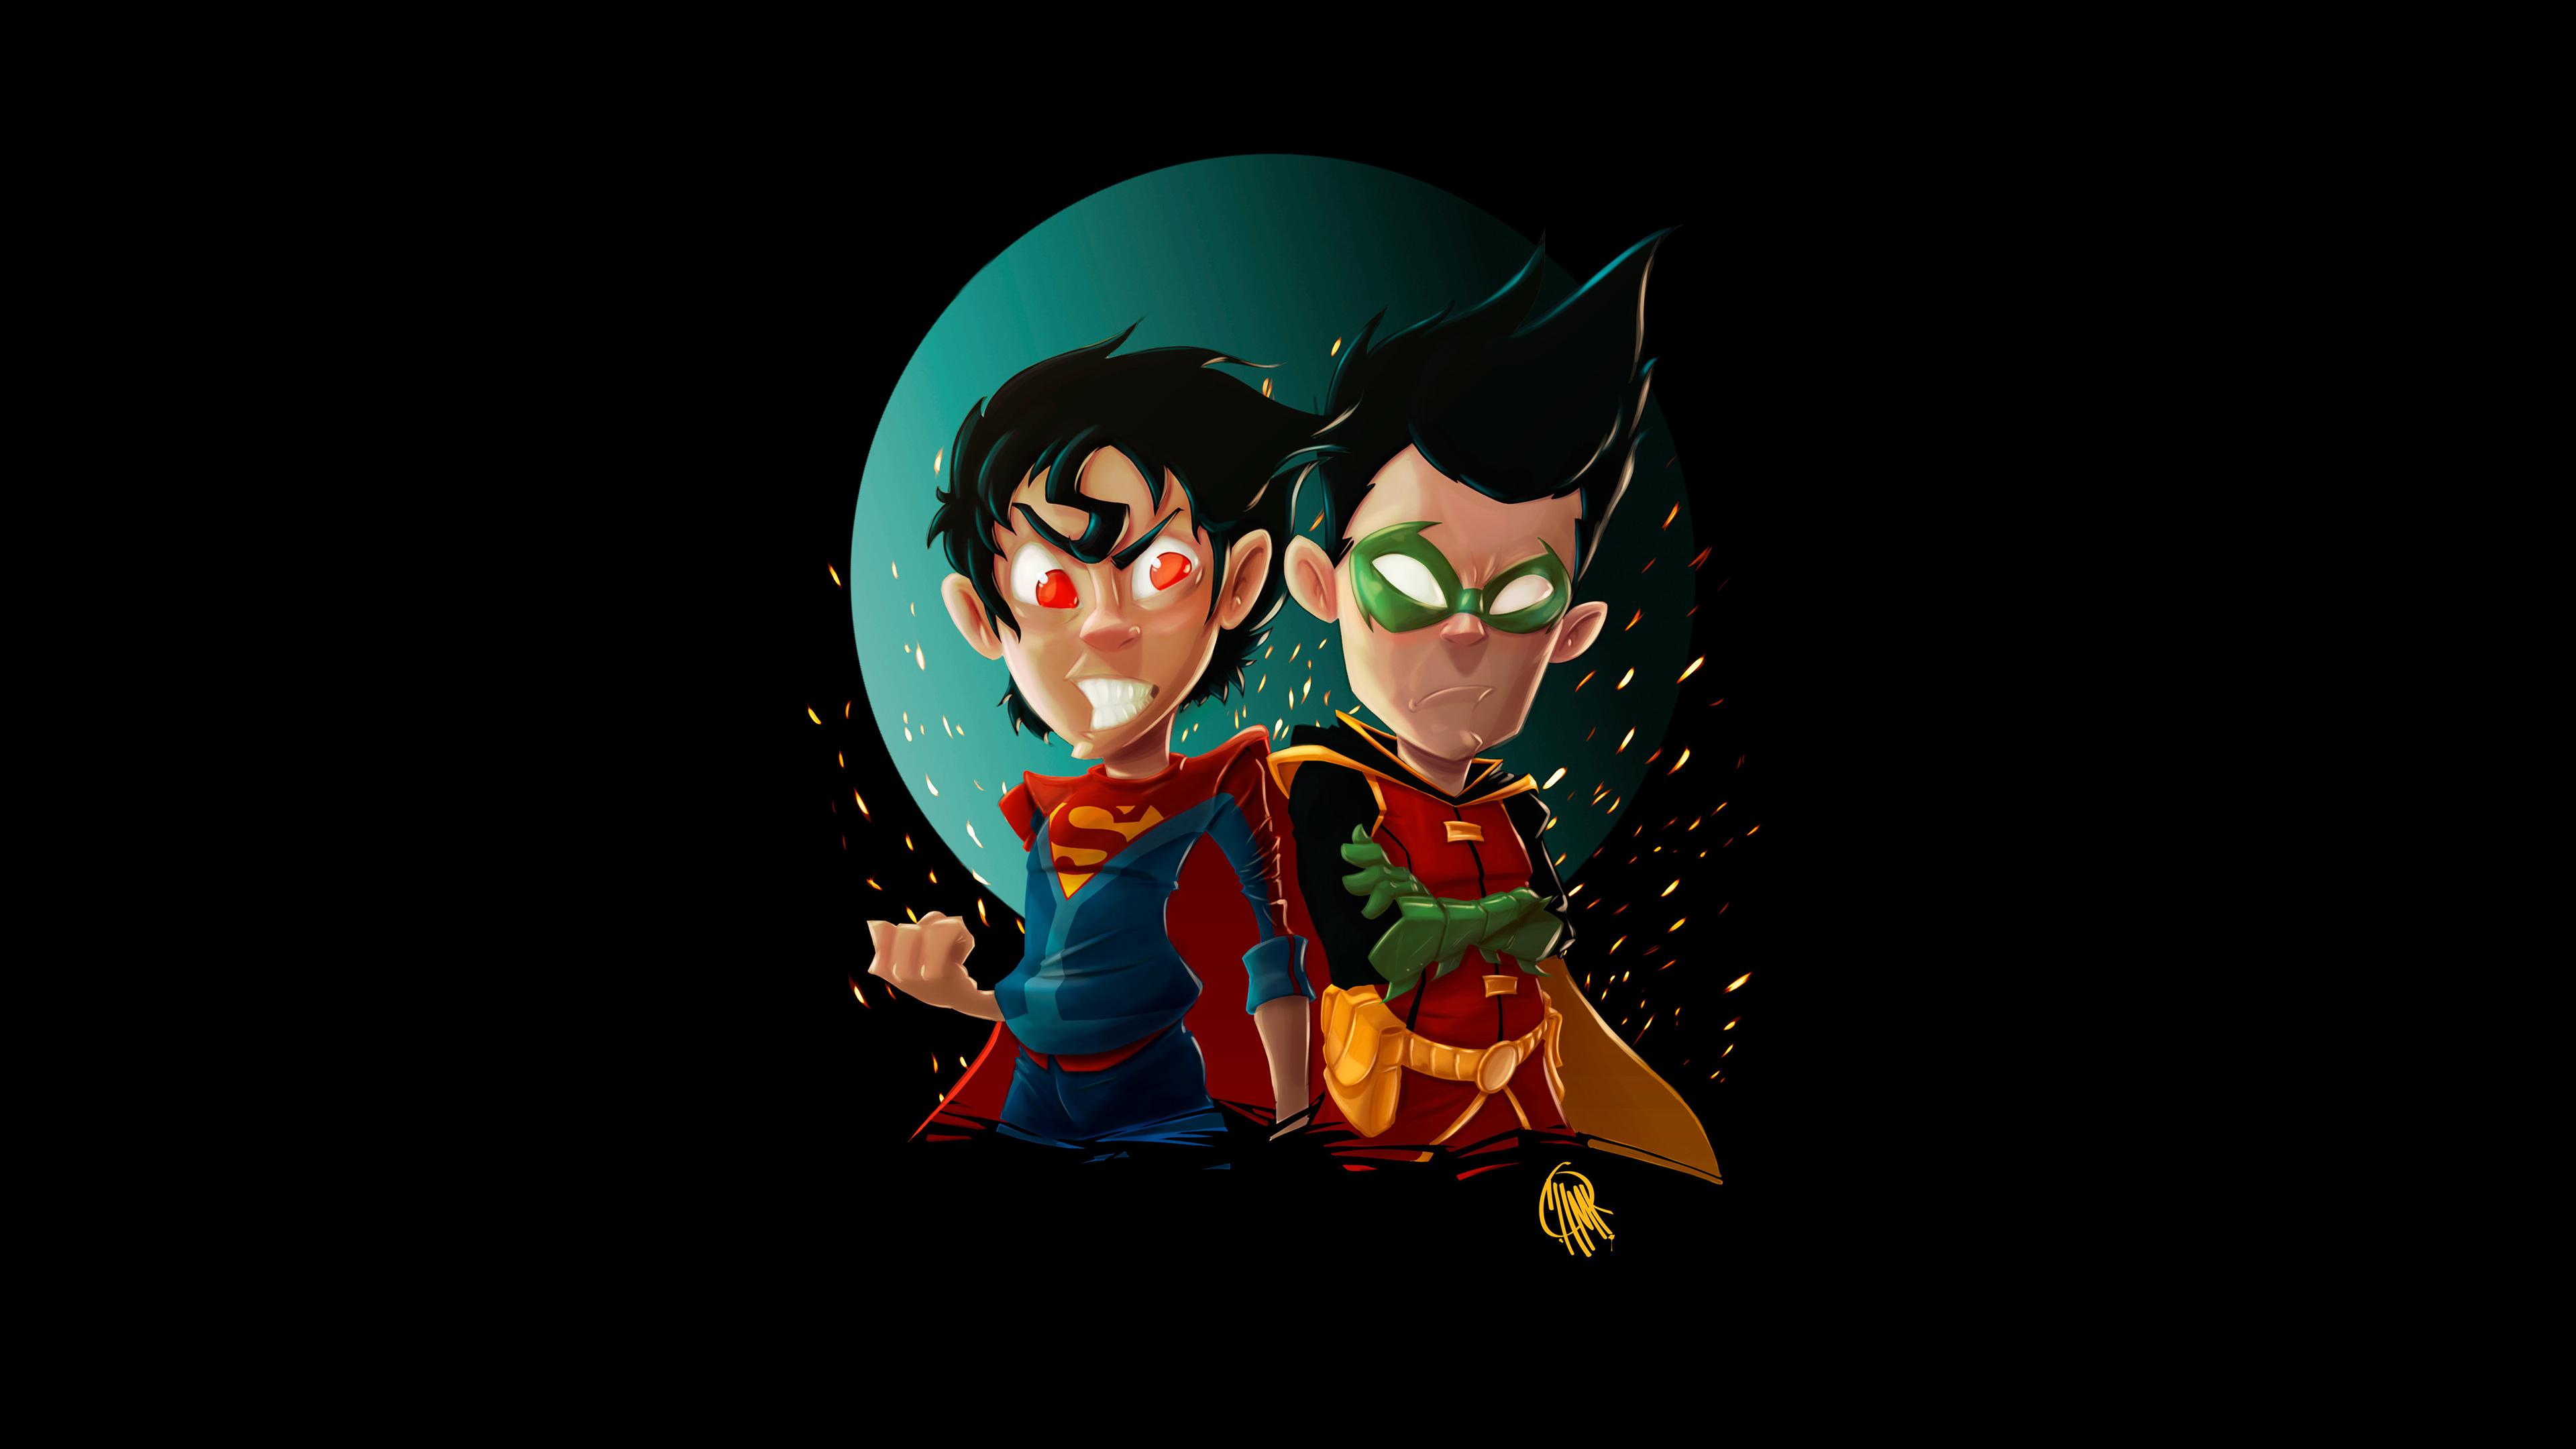 kid superman and robin 1536523095 - Kid Superman And Robin - superman wallpapers, superheroes wallpapers, robin wallpapers, hd-wallpapers, digital art wallpapers, artwork wallpapers, artstation wallpapers, artist wallpapers, 4k-wallpapers